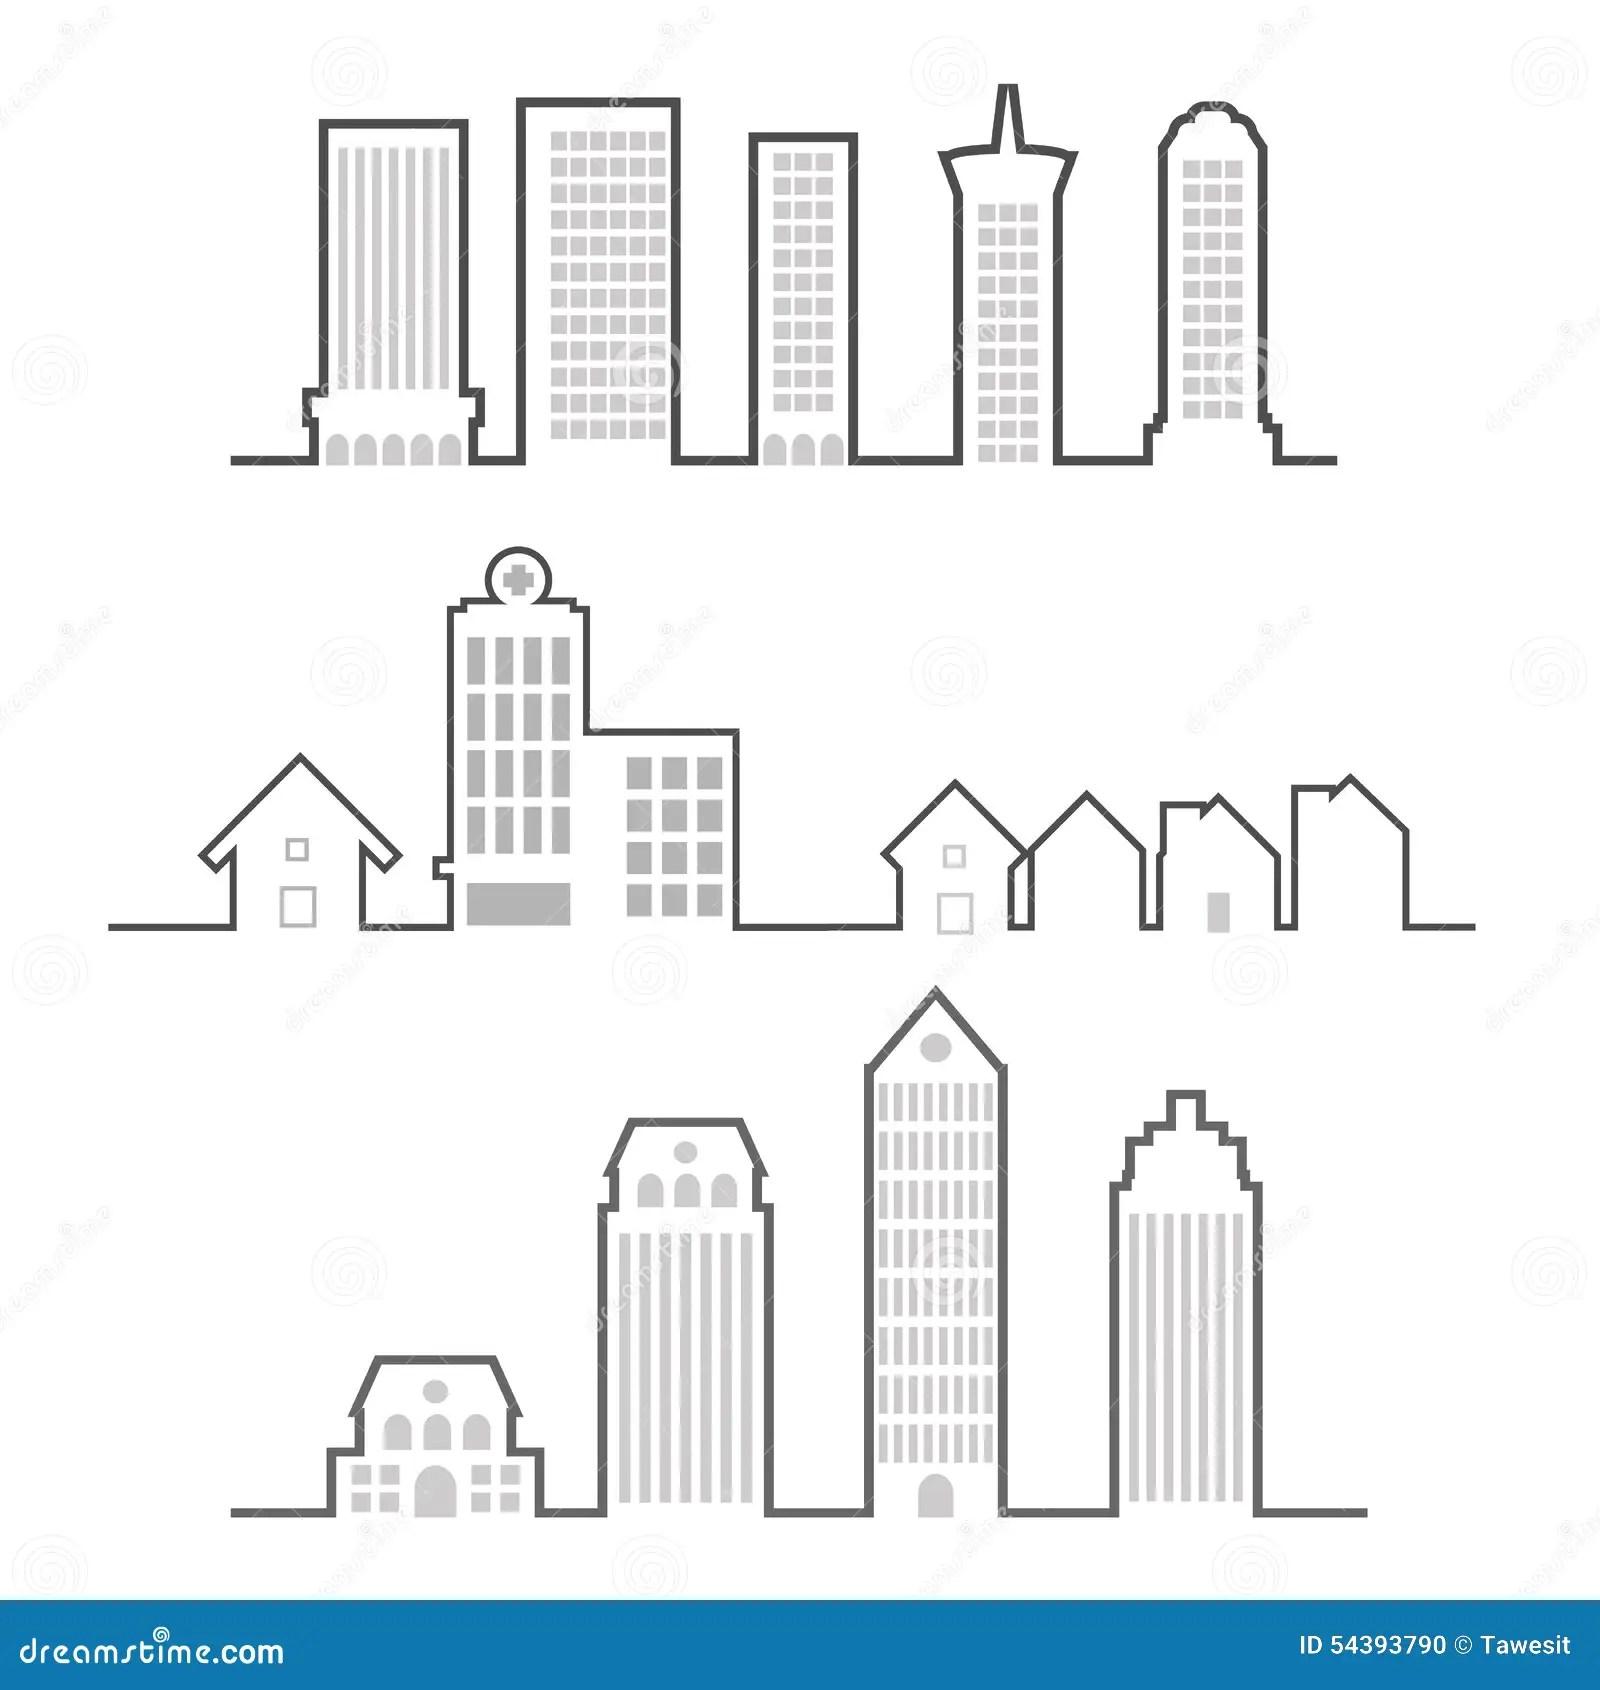 Building outline stock vector. Illustration of skyline